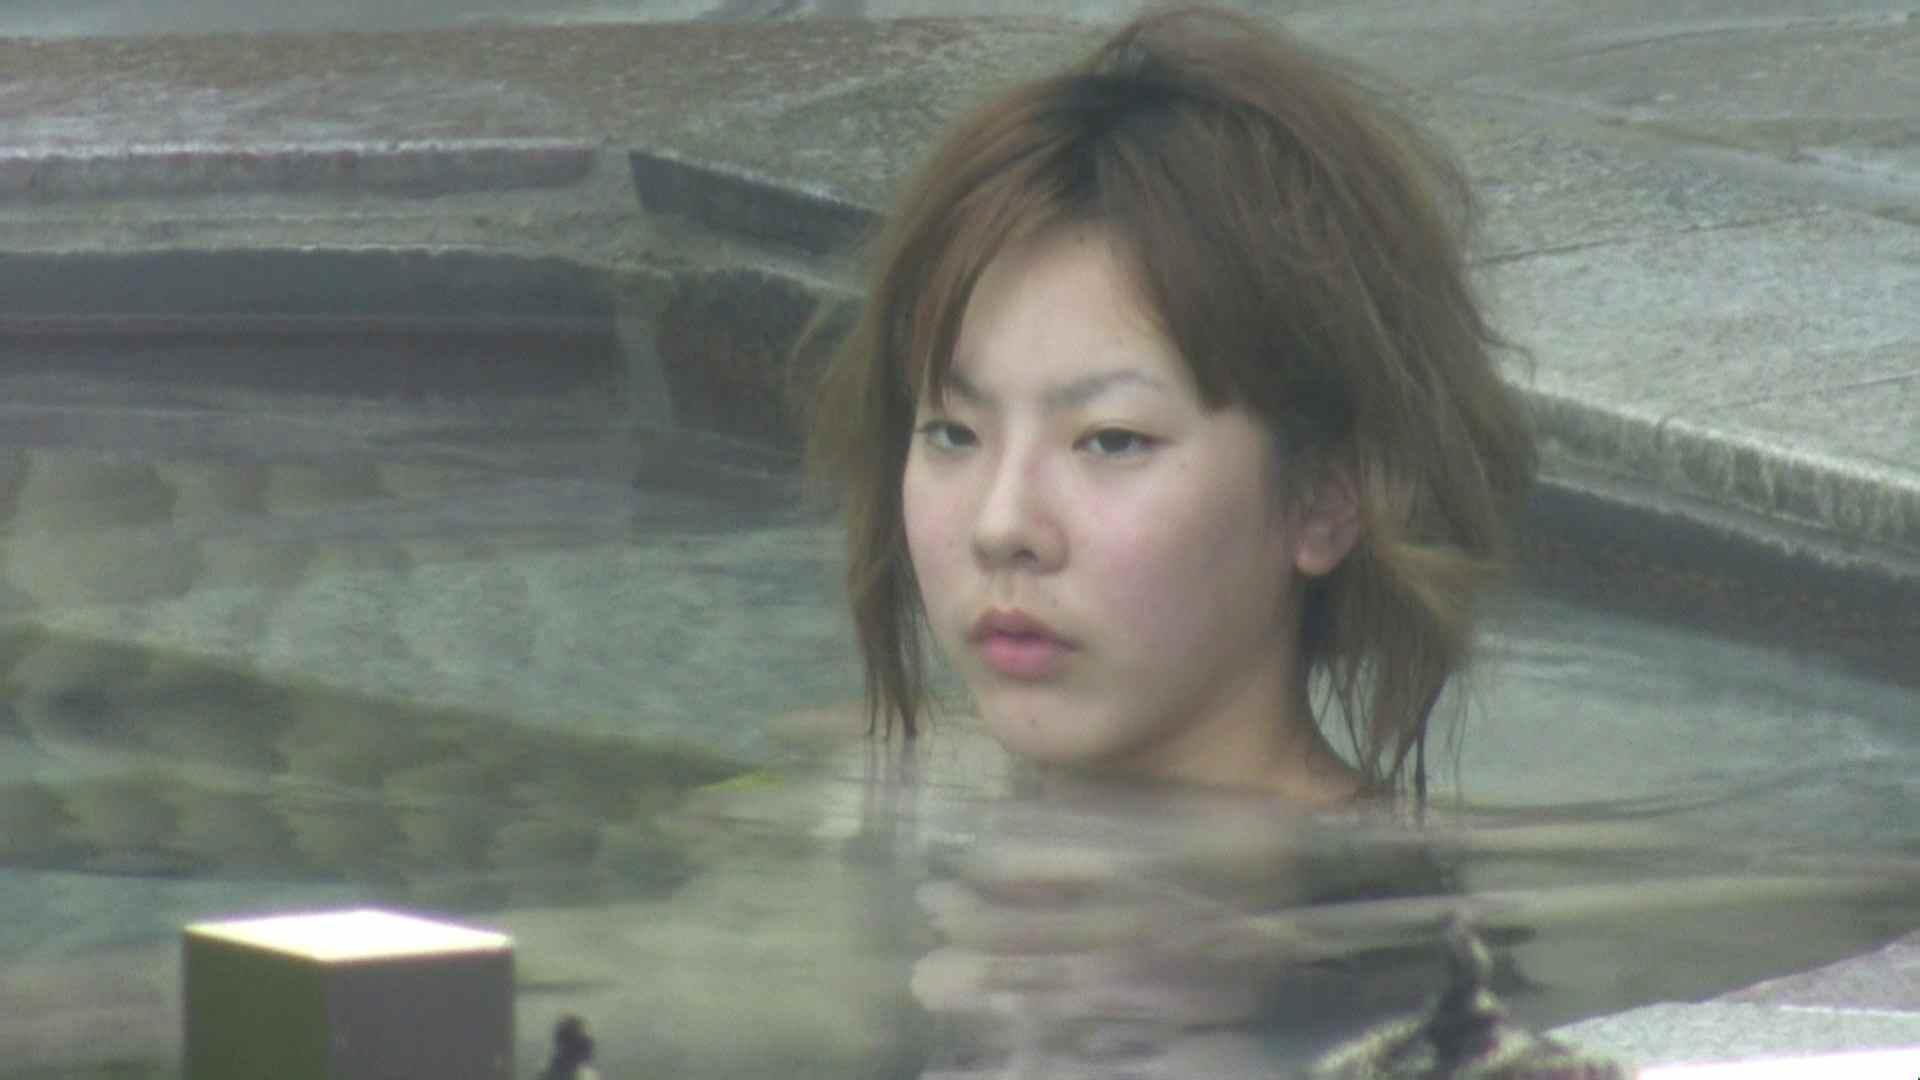 Aquaな露天風呂Vol.38【VIP】 露天風呂  10枚 2